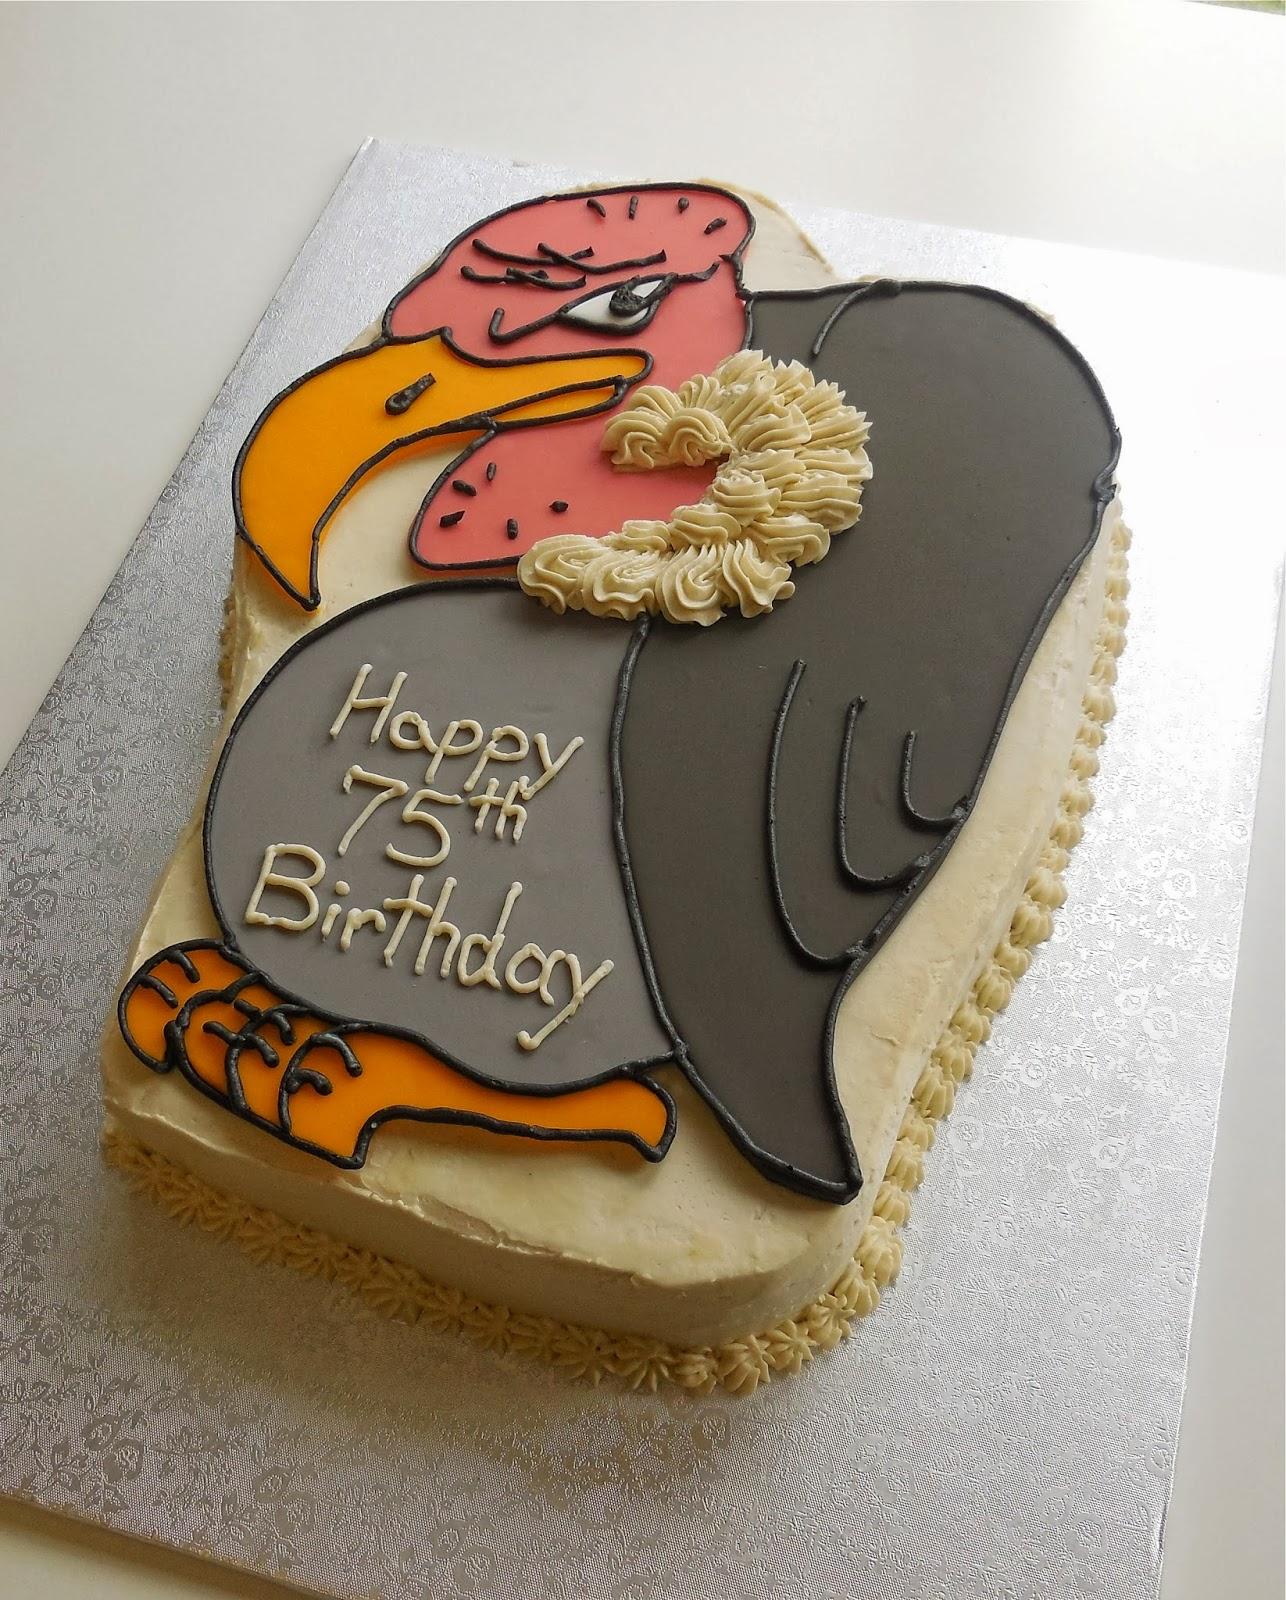 Custom Cakes By Lori A Buzzard Cake For A 75th Birthday